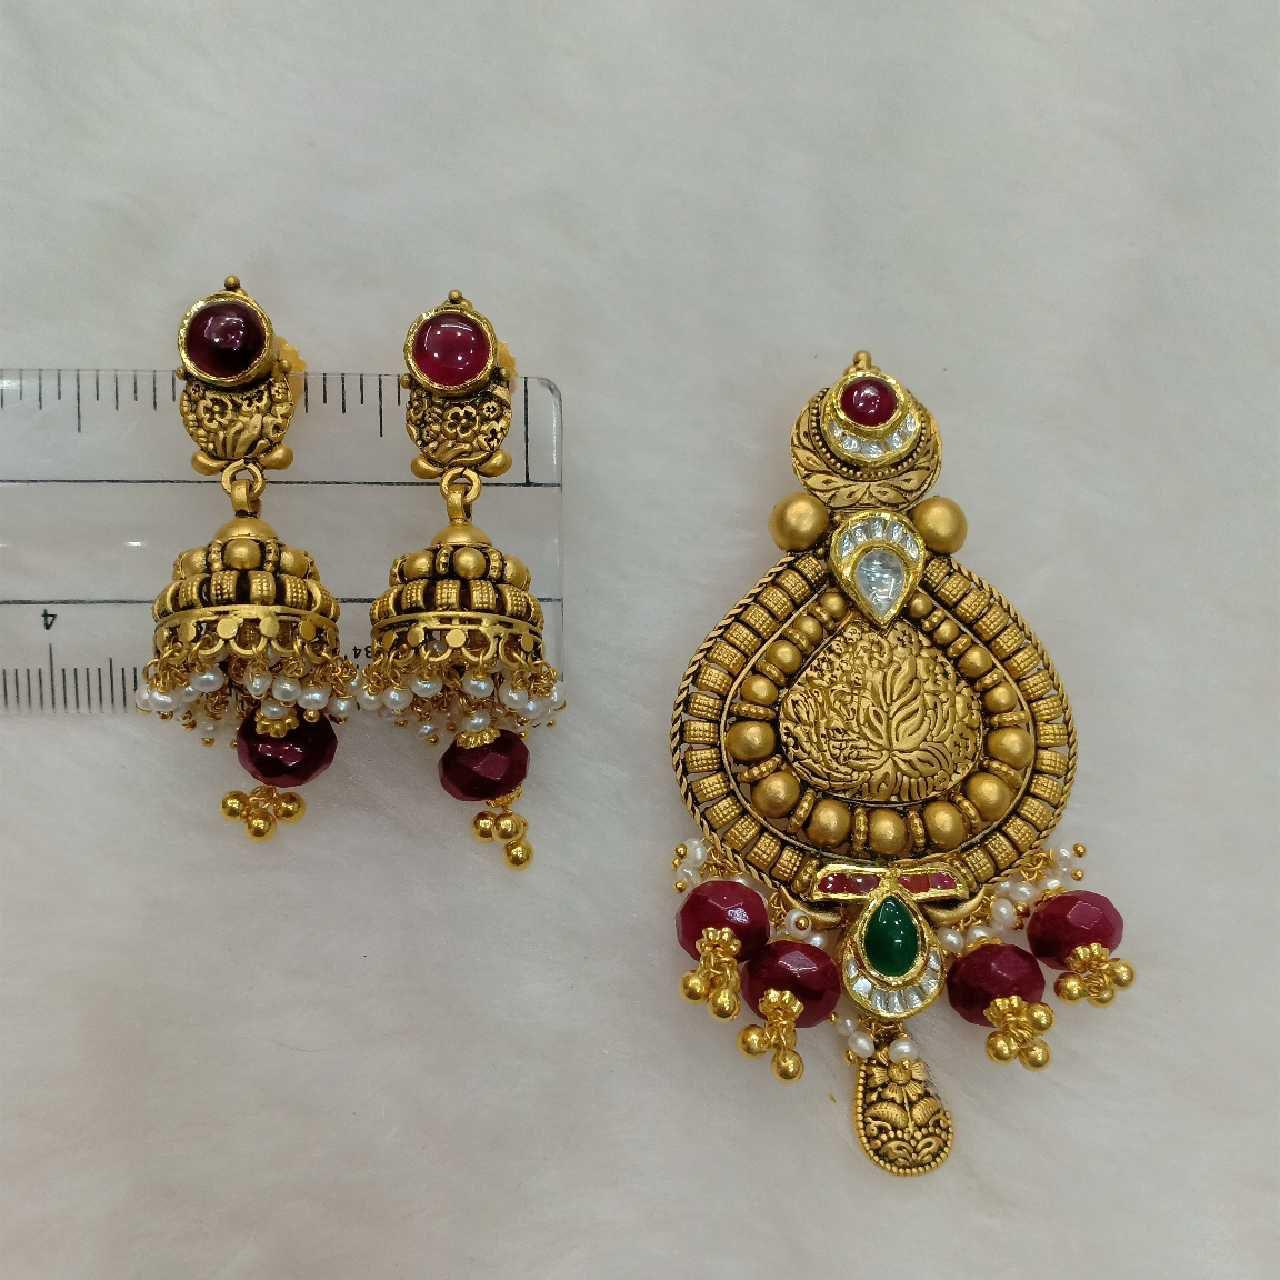 91.6 Antique Gold Jadtar Pendant Set Aps-002